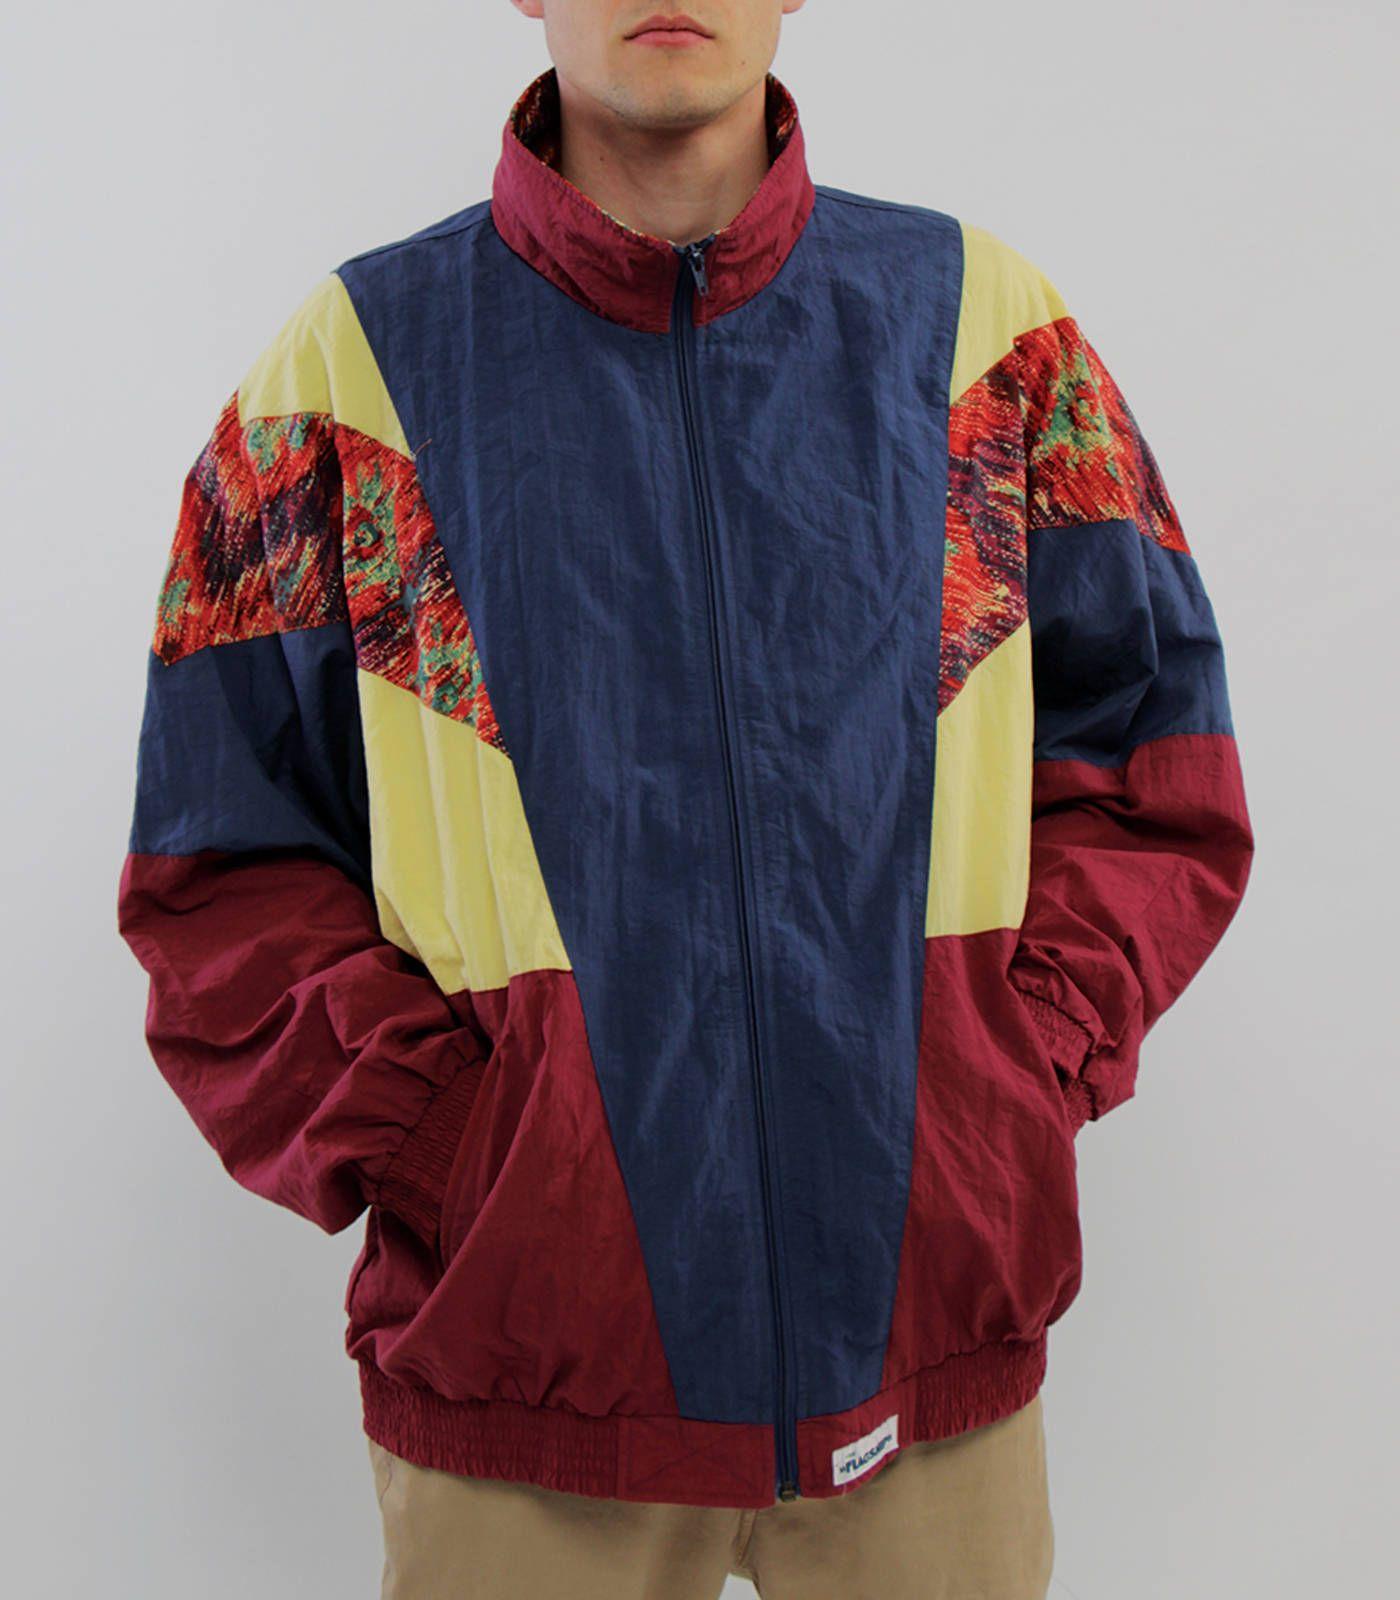 Vintage windbreaker athletic unisex jacket multicolor arty